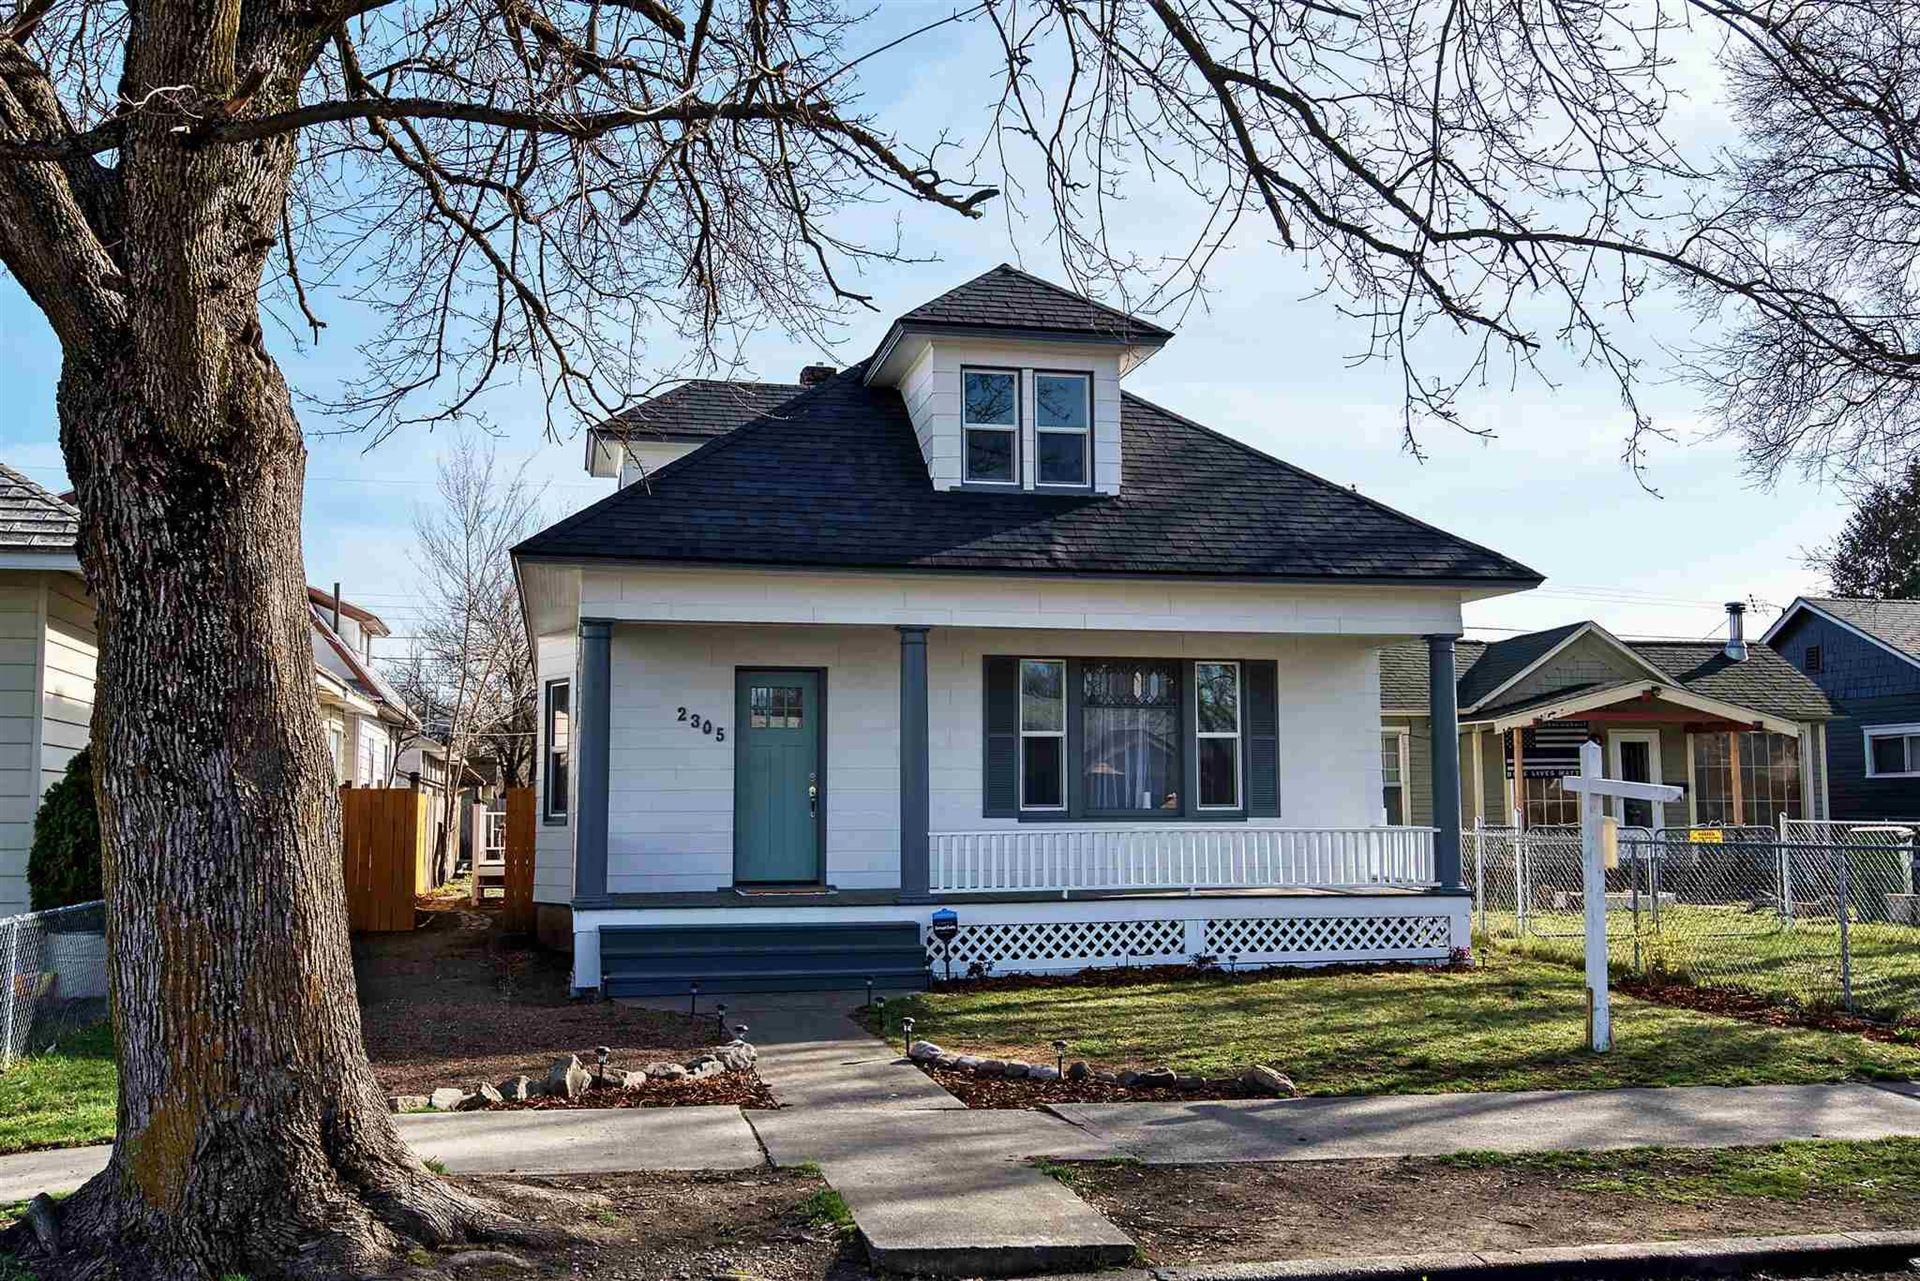 2305 W Sharp Ave, Spokane, WA 99201 - #: 202113419